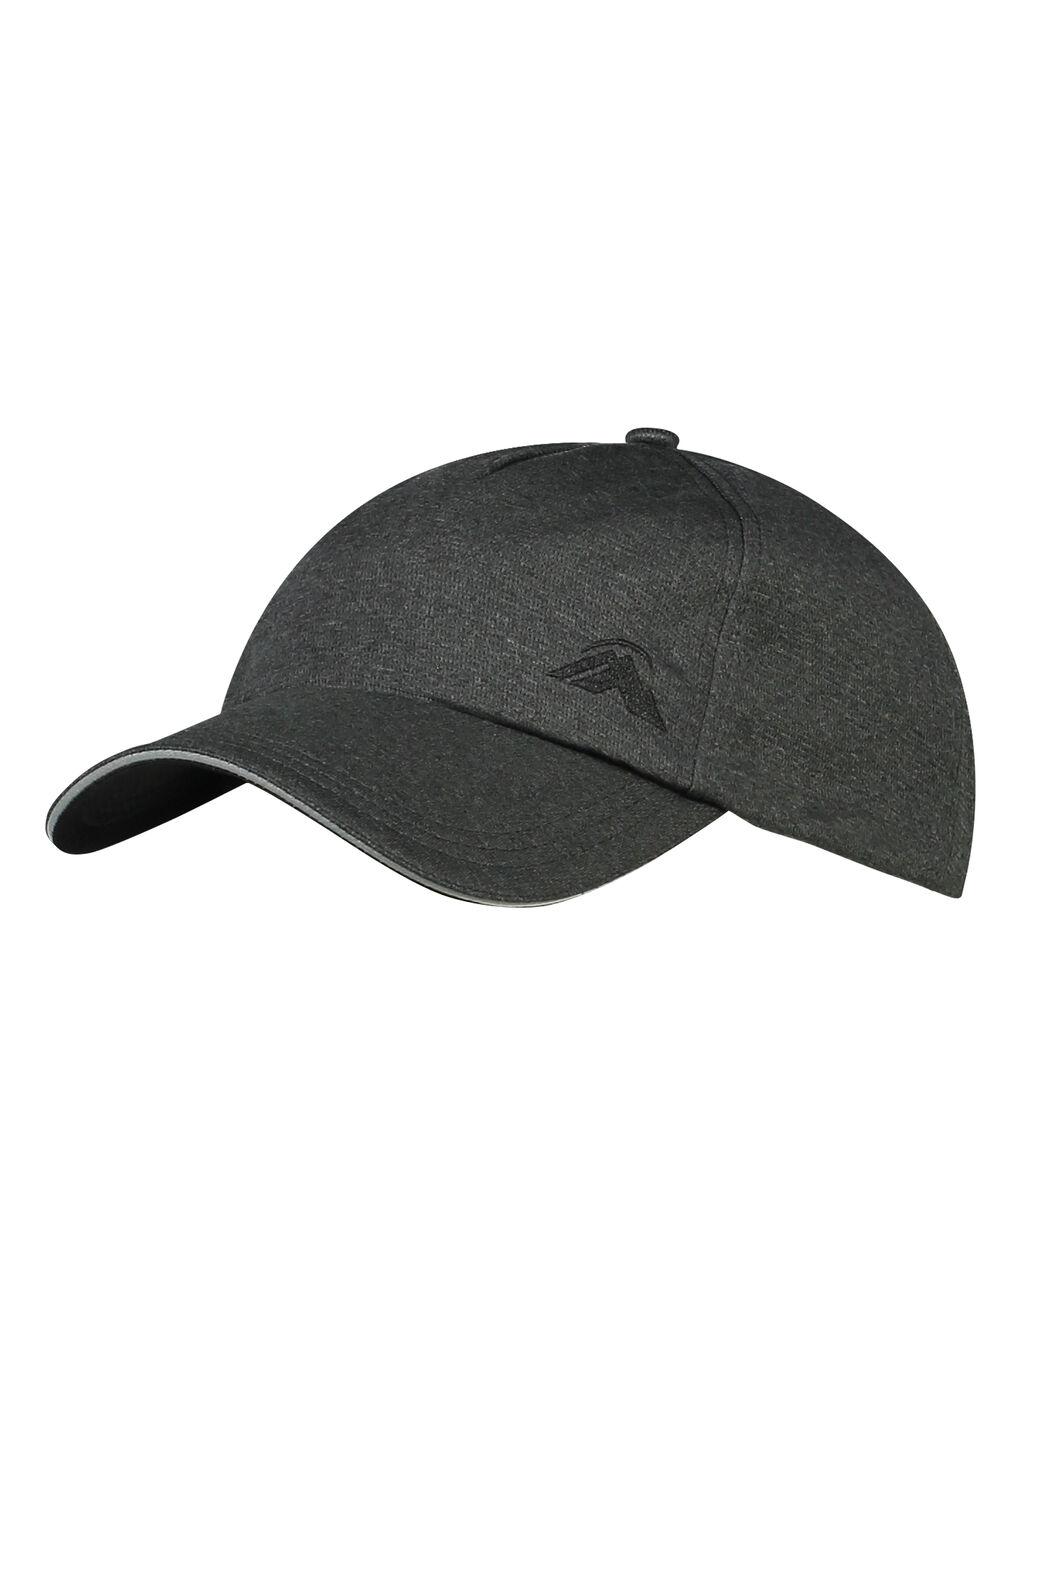 Trail Cap, Dark Grey, hi-res